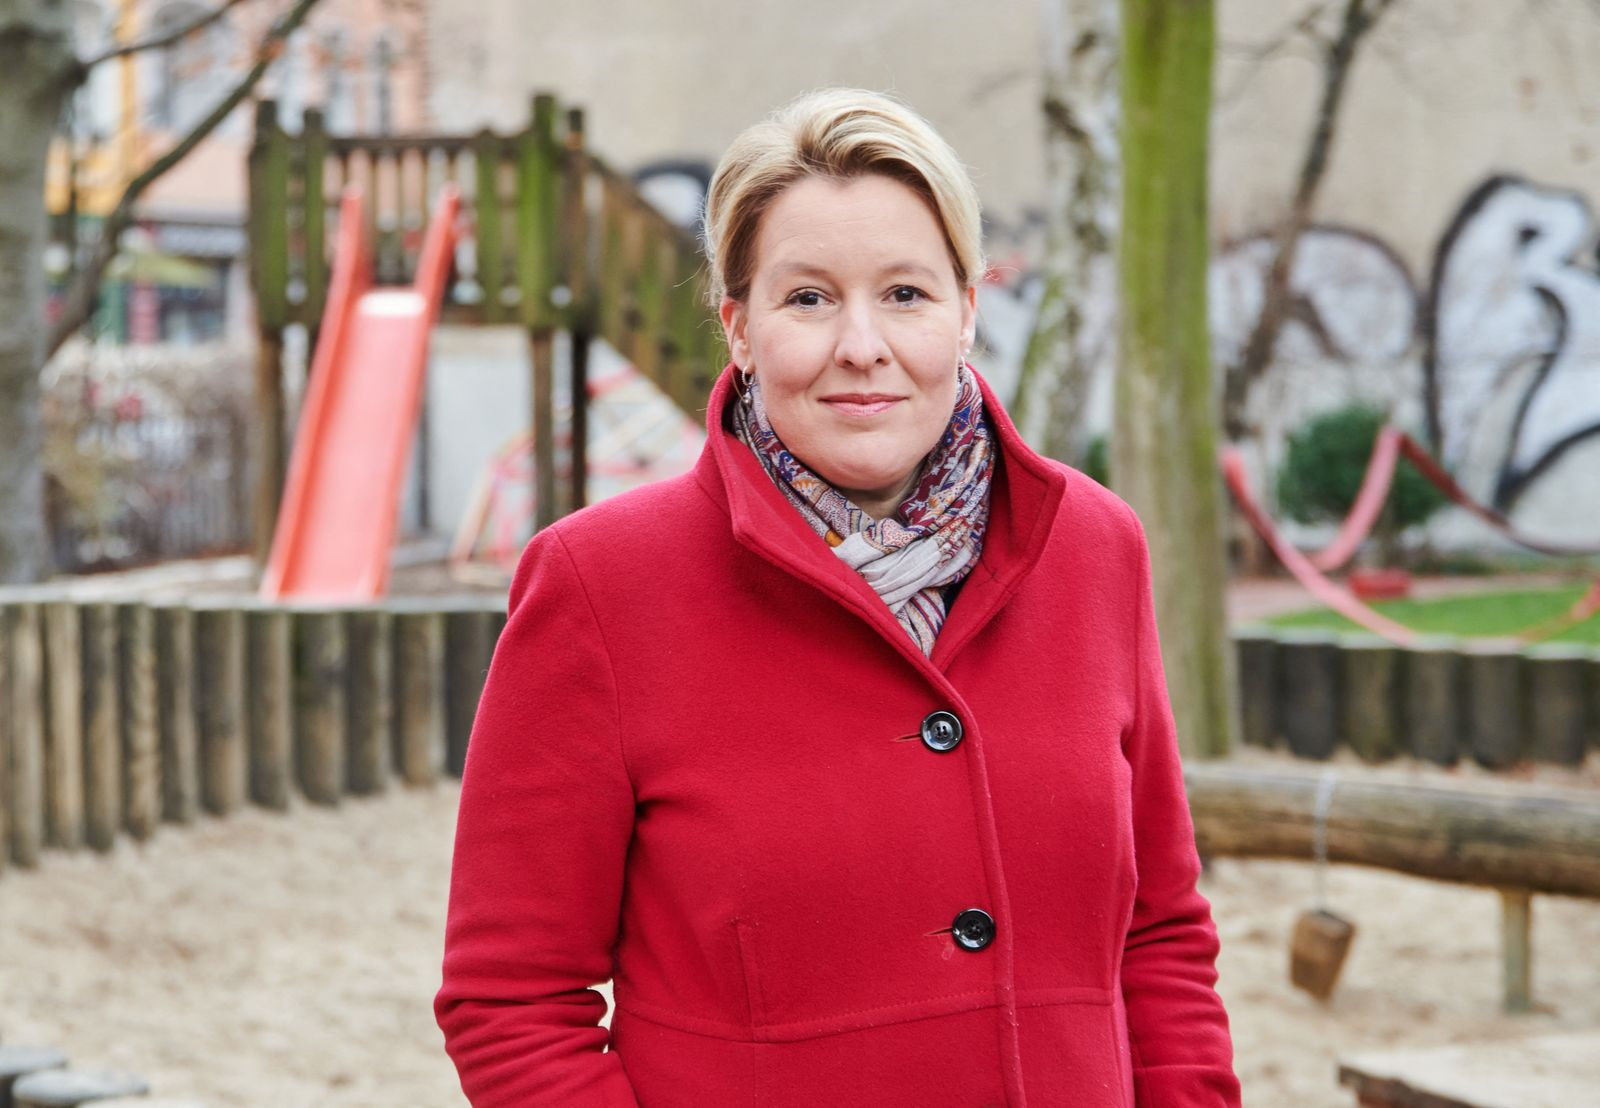 GERMANY-POLITICS-HEALTH-VIRUS-SCHOOL